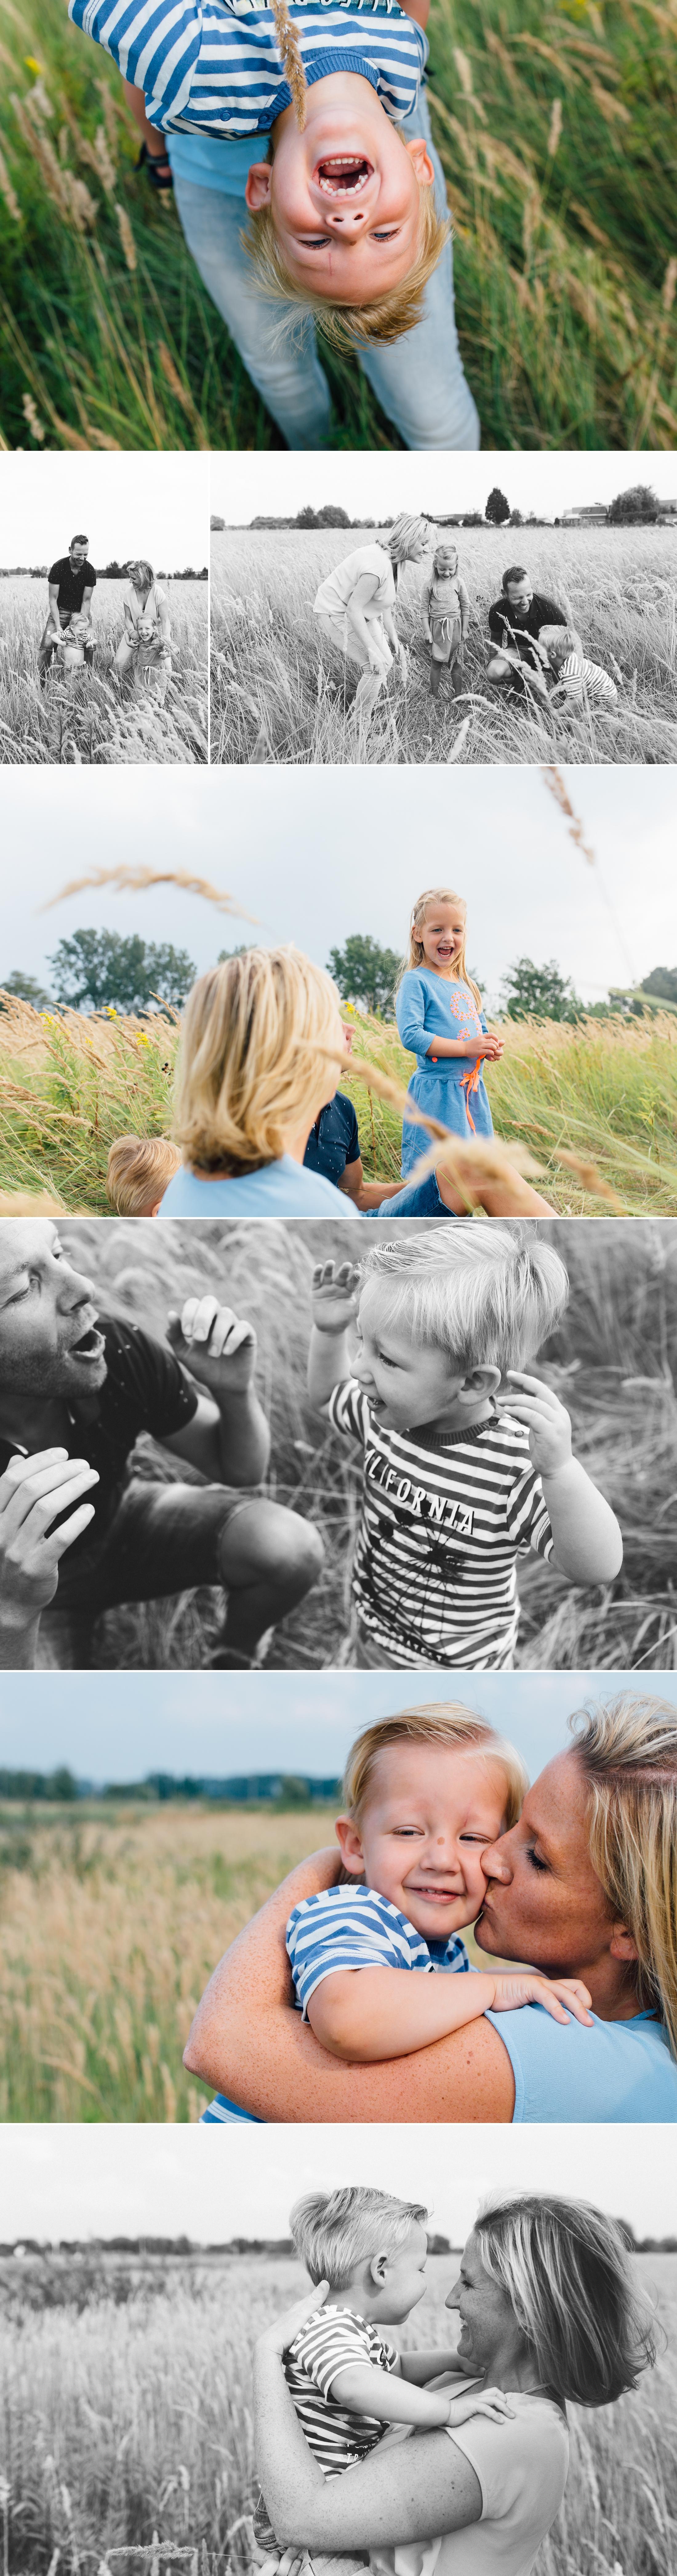 Familie_fotograaf_Rijnsburg